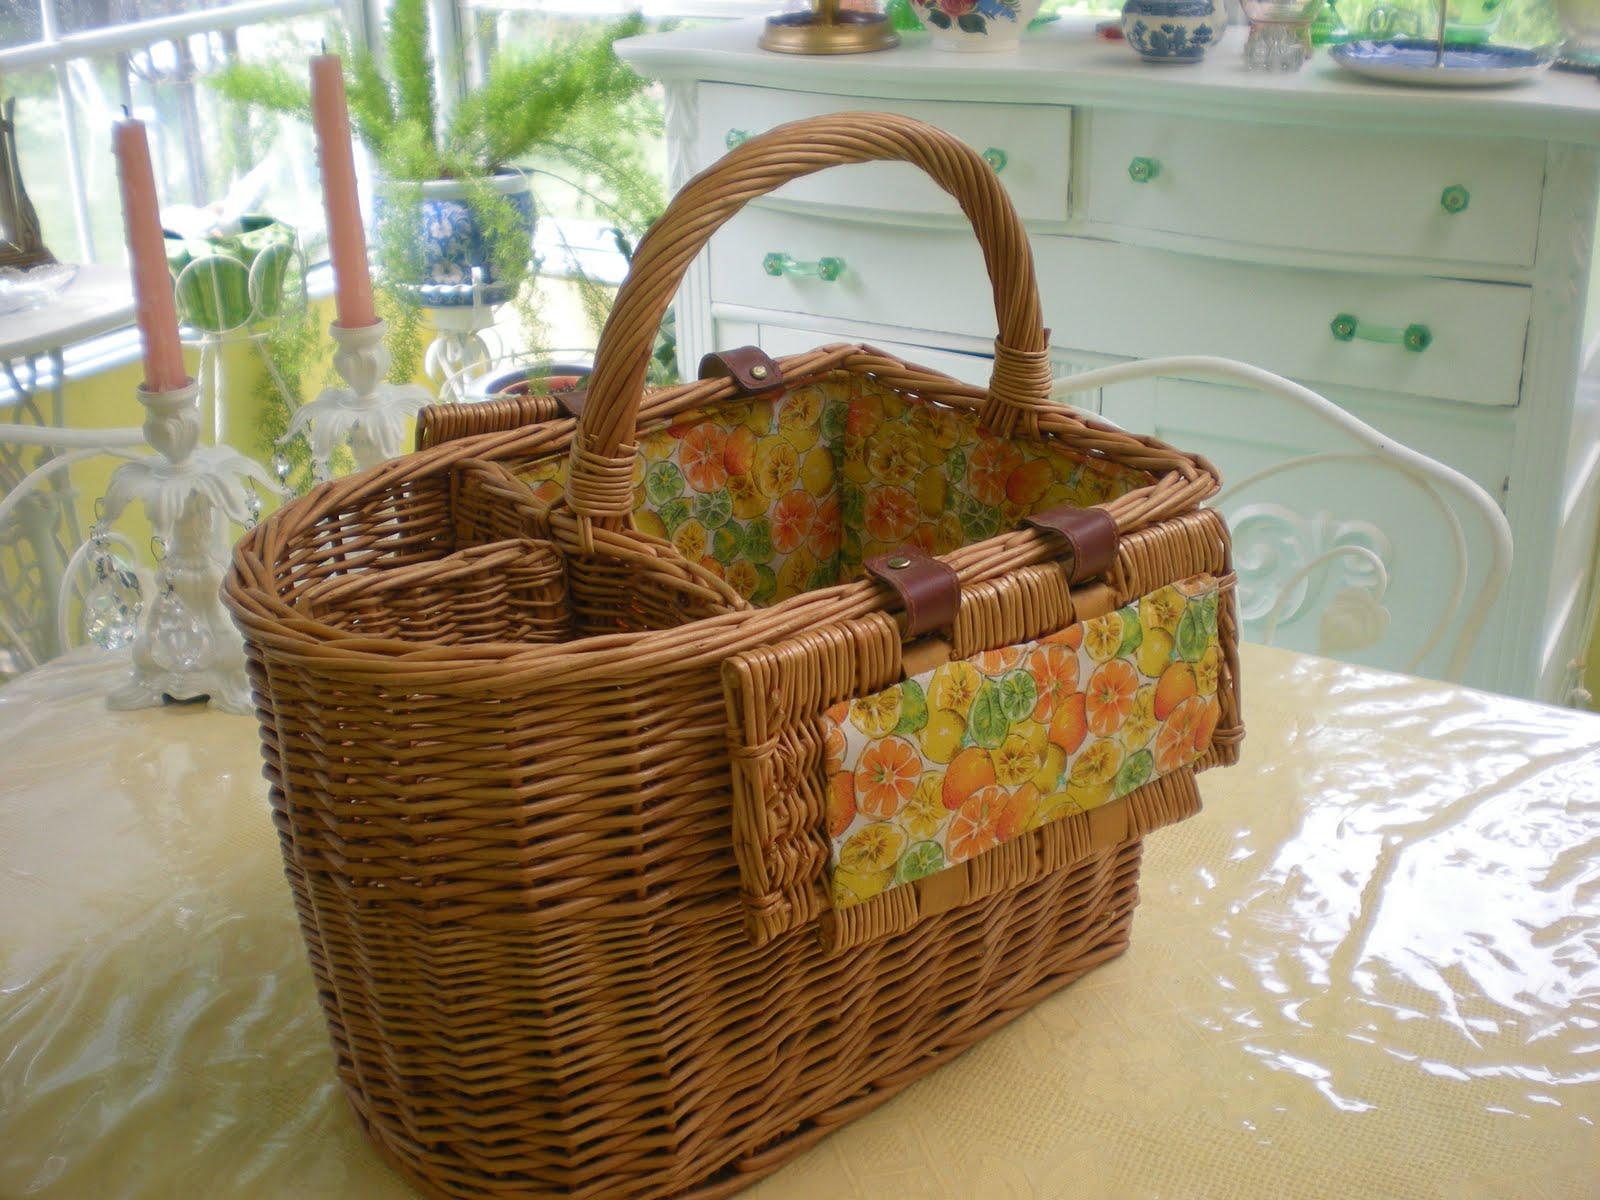 Woven Basket Procedure : Laura s rose garden revamping an old wicker picnic basket